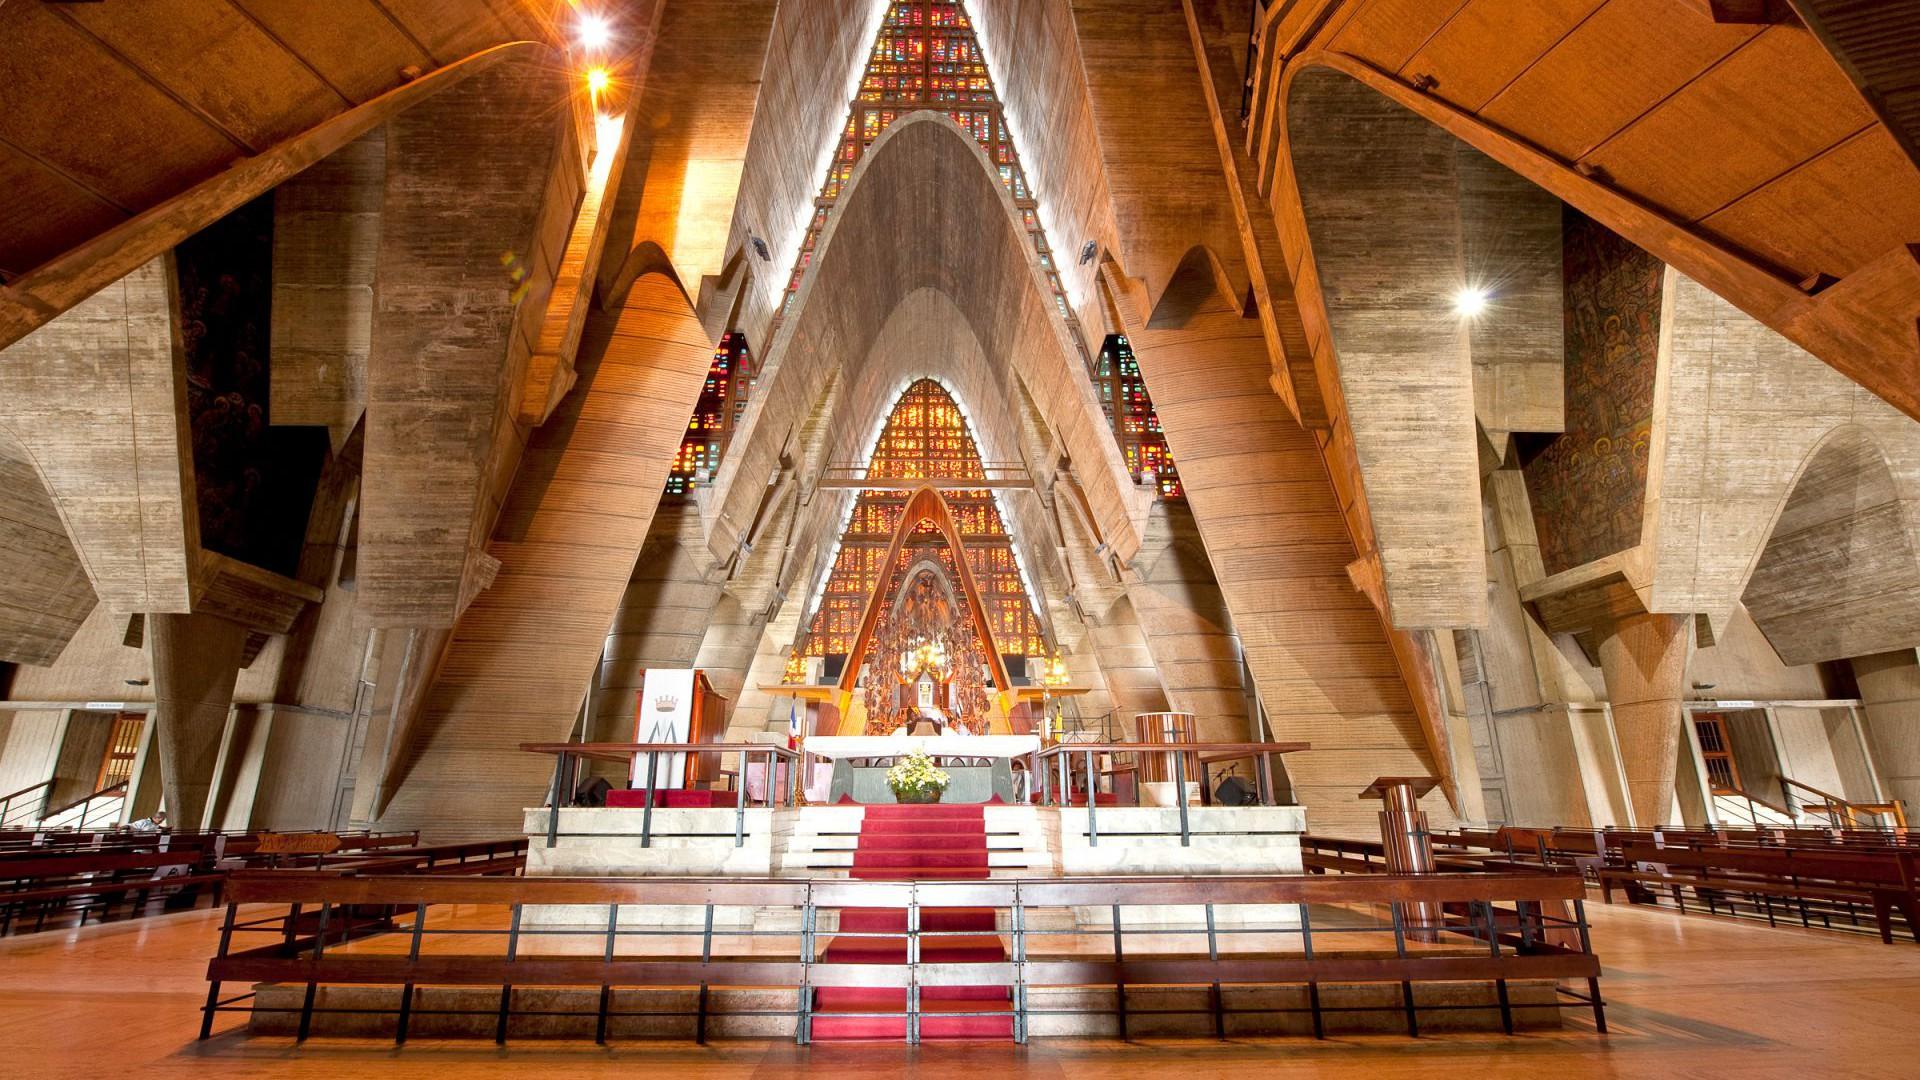 Basilica-de-Higuey-1920x1080.jpg